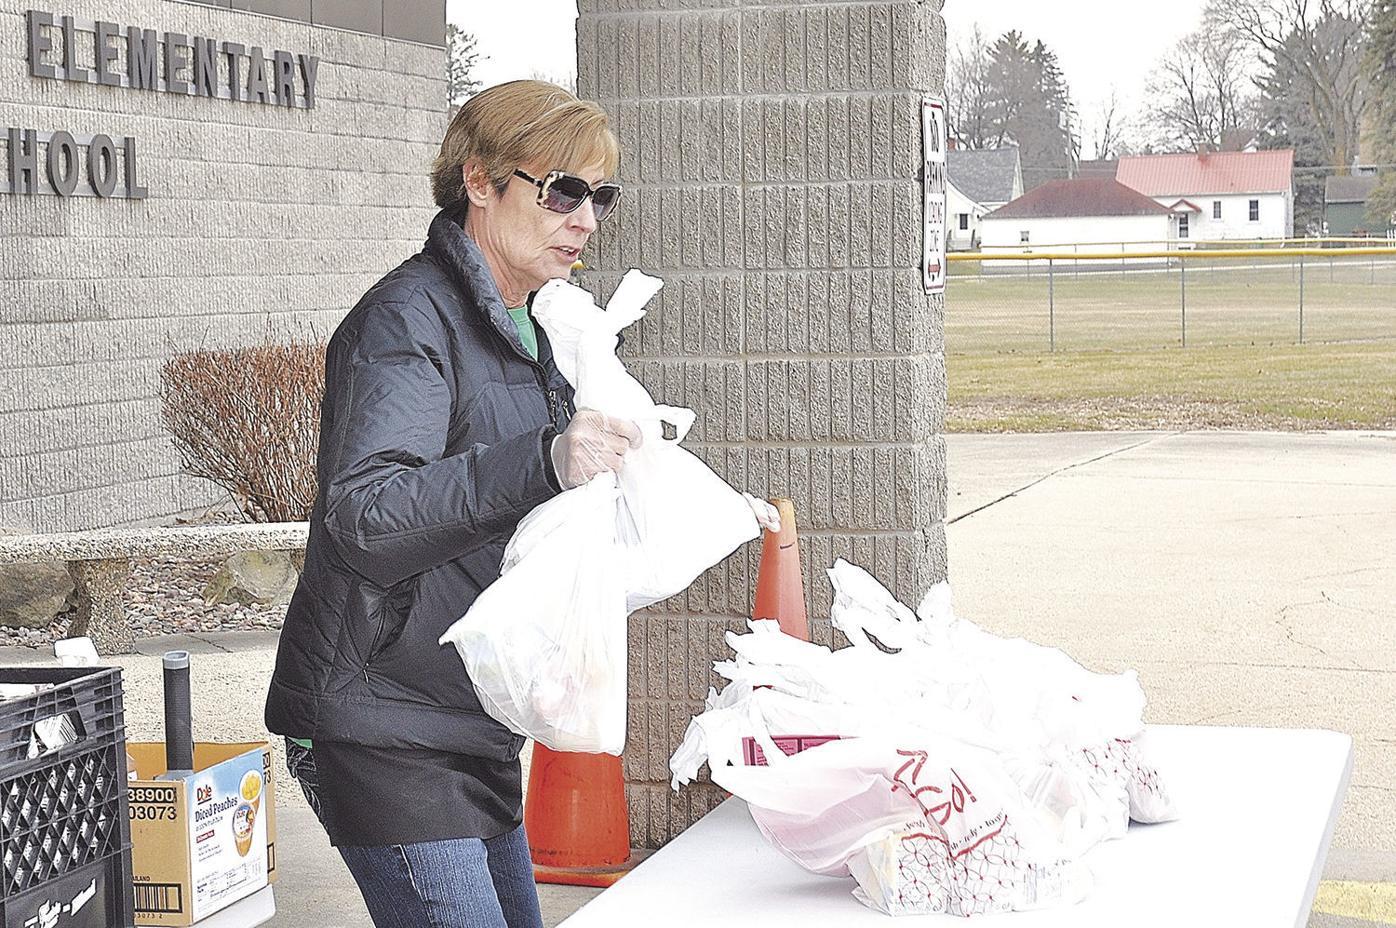 Jefferson schools kick off curbside food distribution